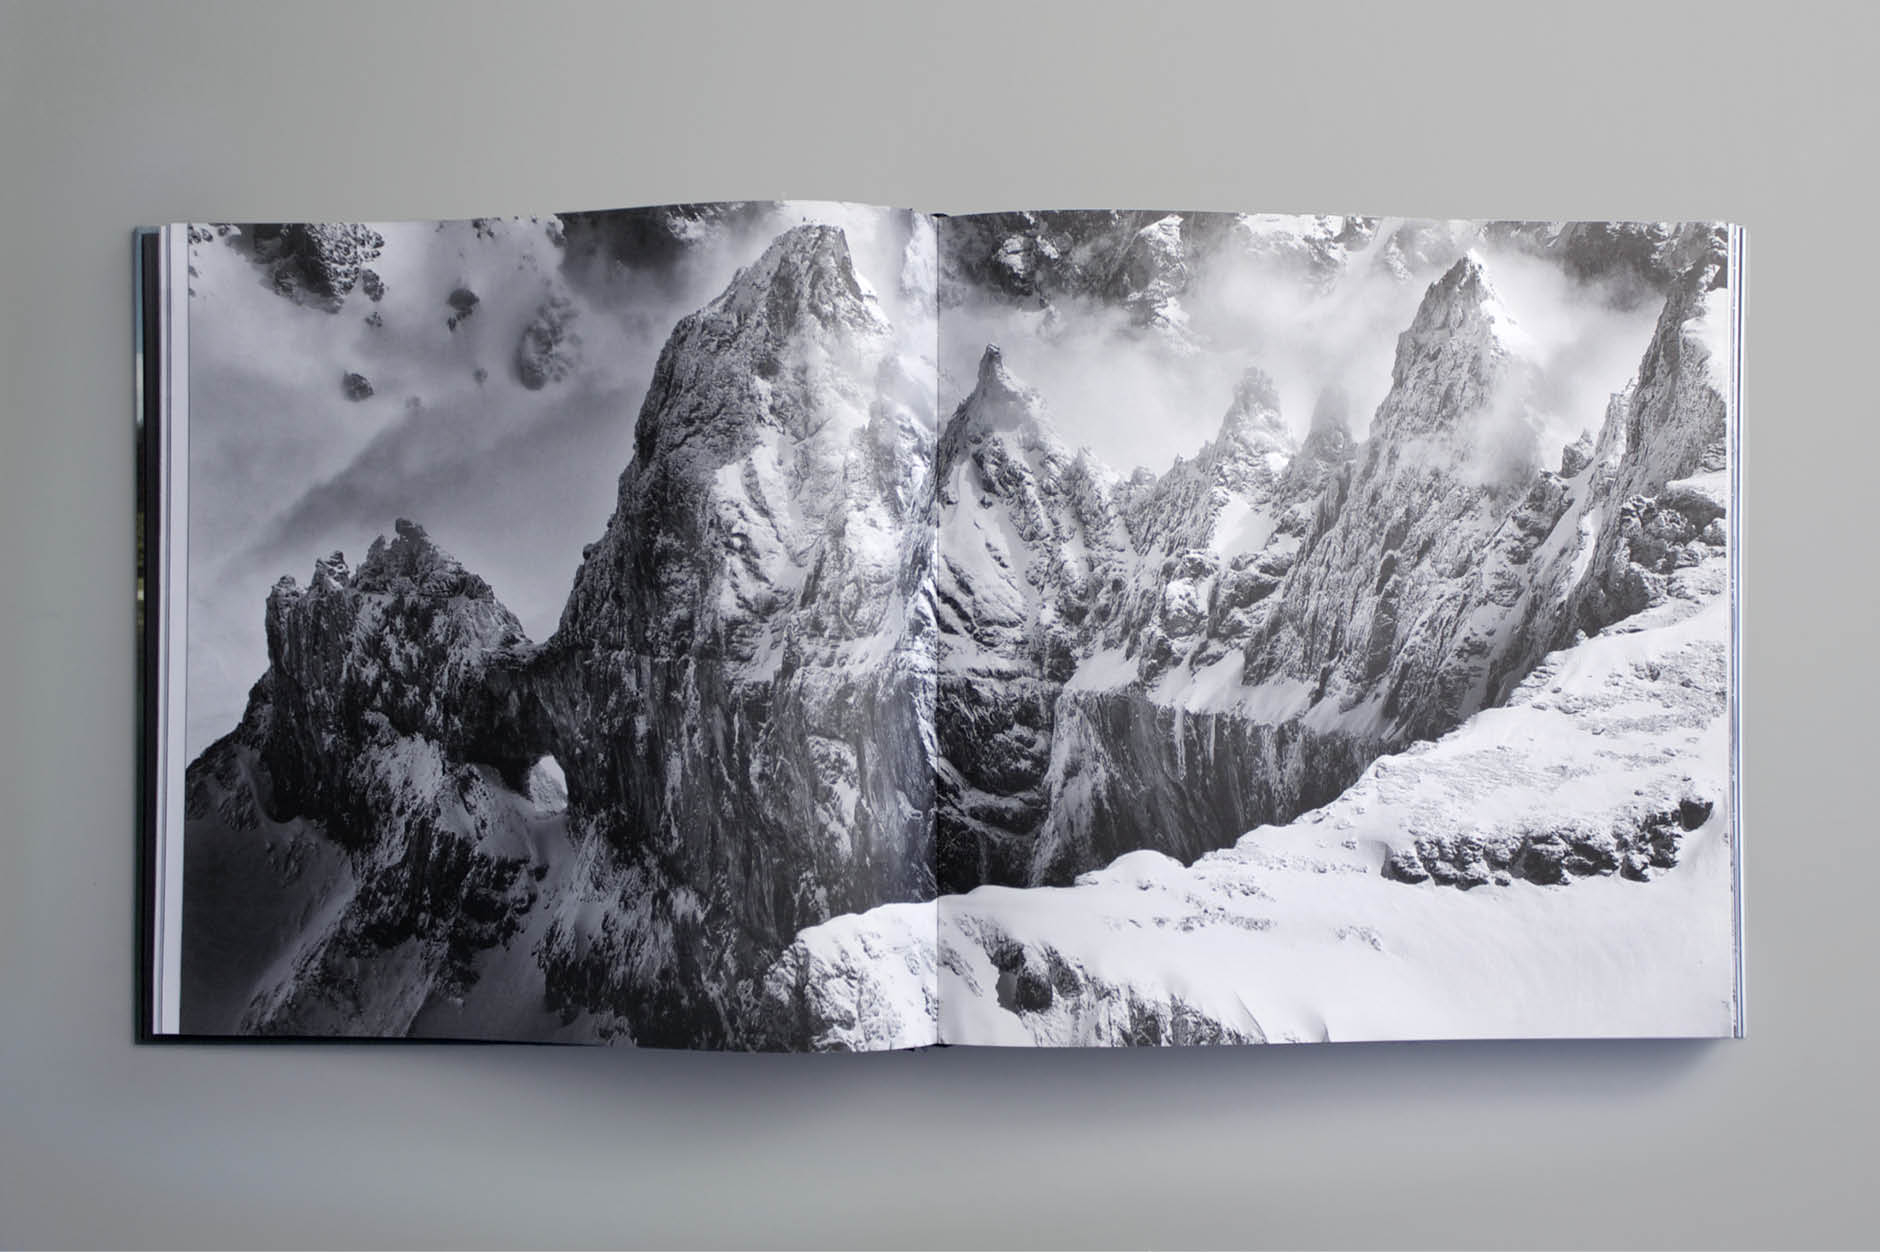 Prozess Wag Buch Berge